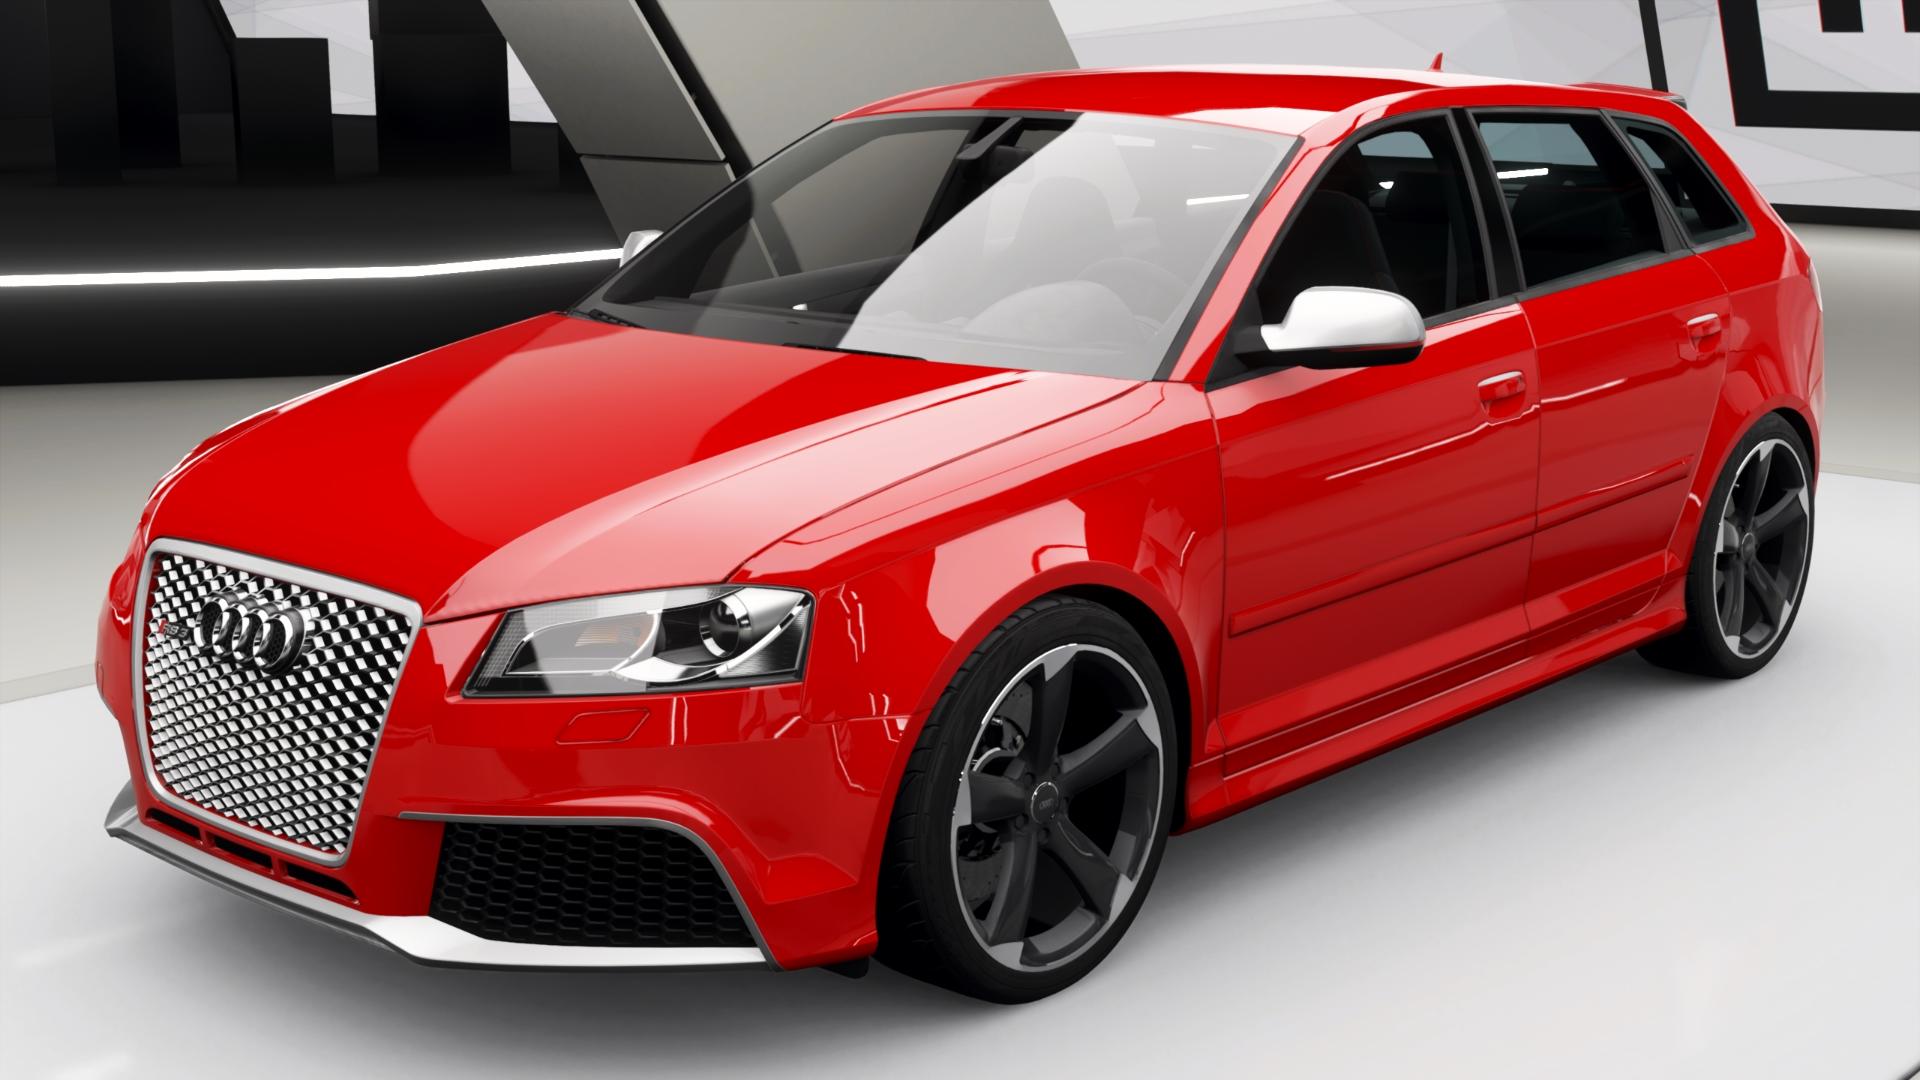 Audi RS 3 Sportback | Forza Motorsport Wiki | FANDOM powered